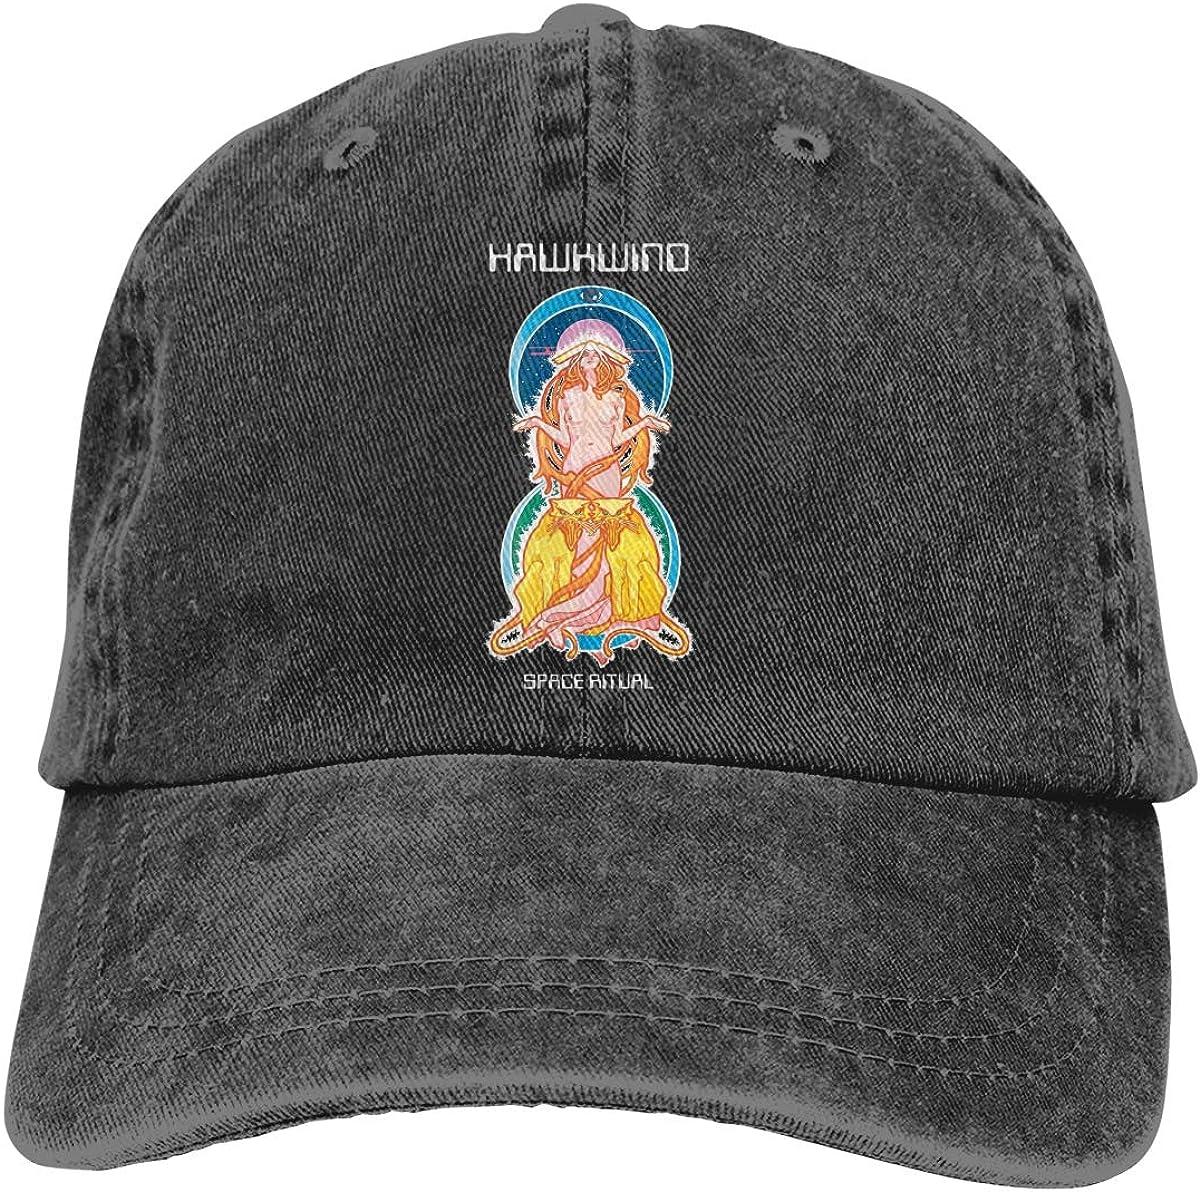 Men and Women 3D Printed Wild Hawkwind Cowboy Hat Black